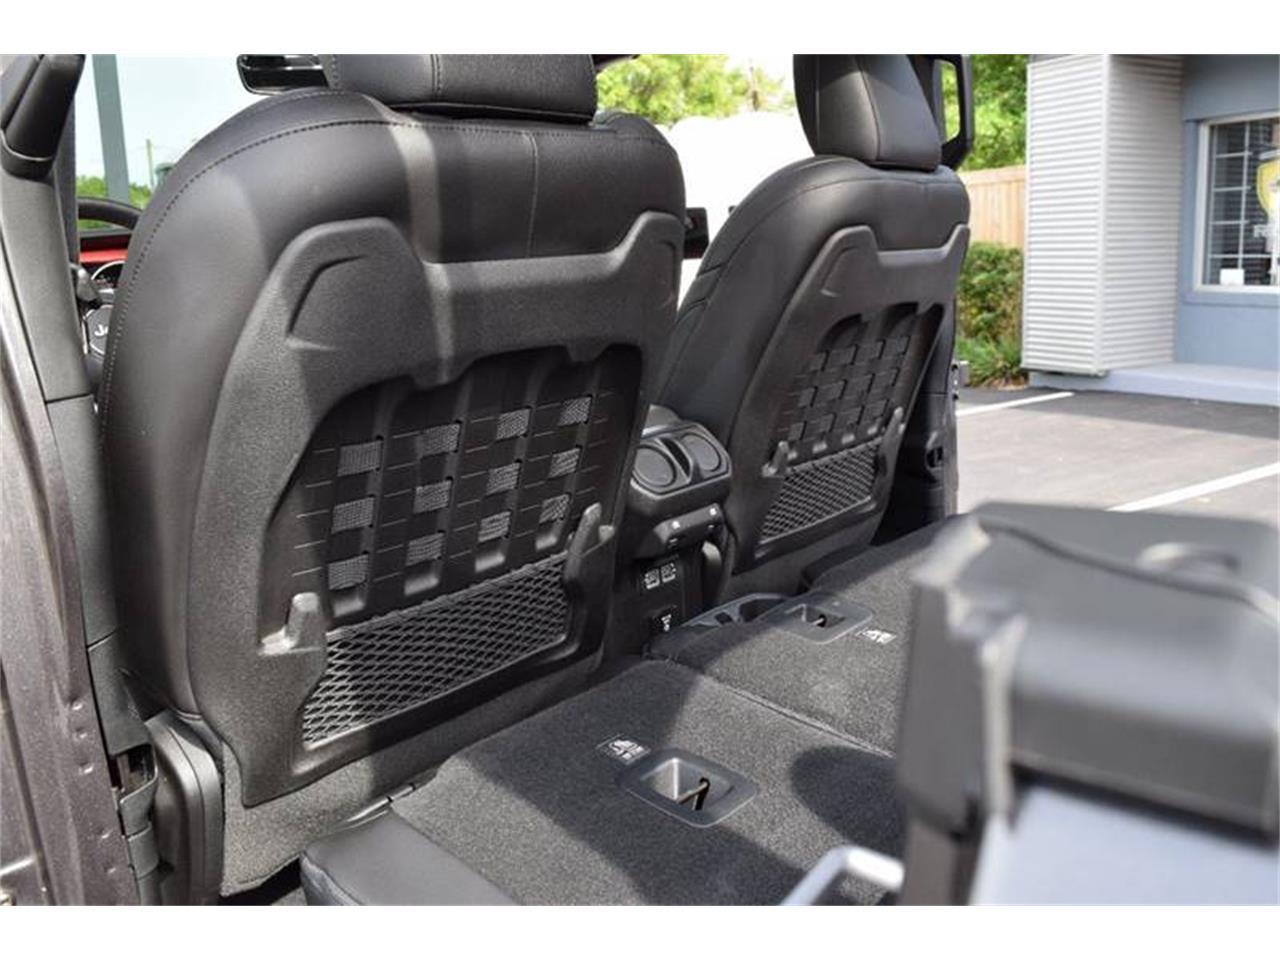 2018 Jeep Wrangler (CC-1240684) for sale in Biloxi, Mississippi